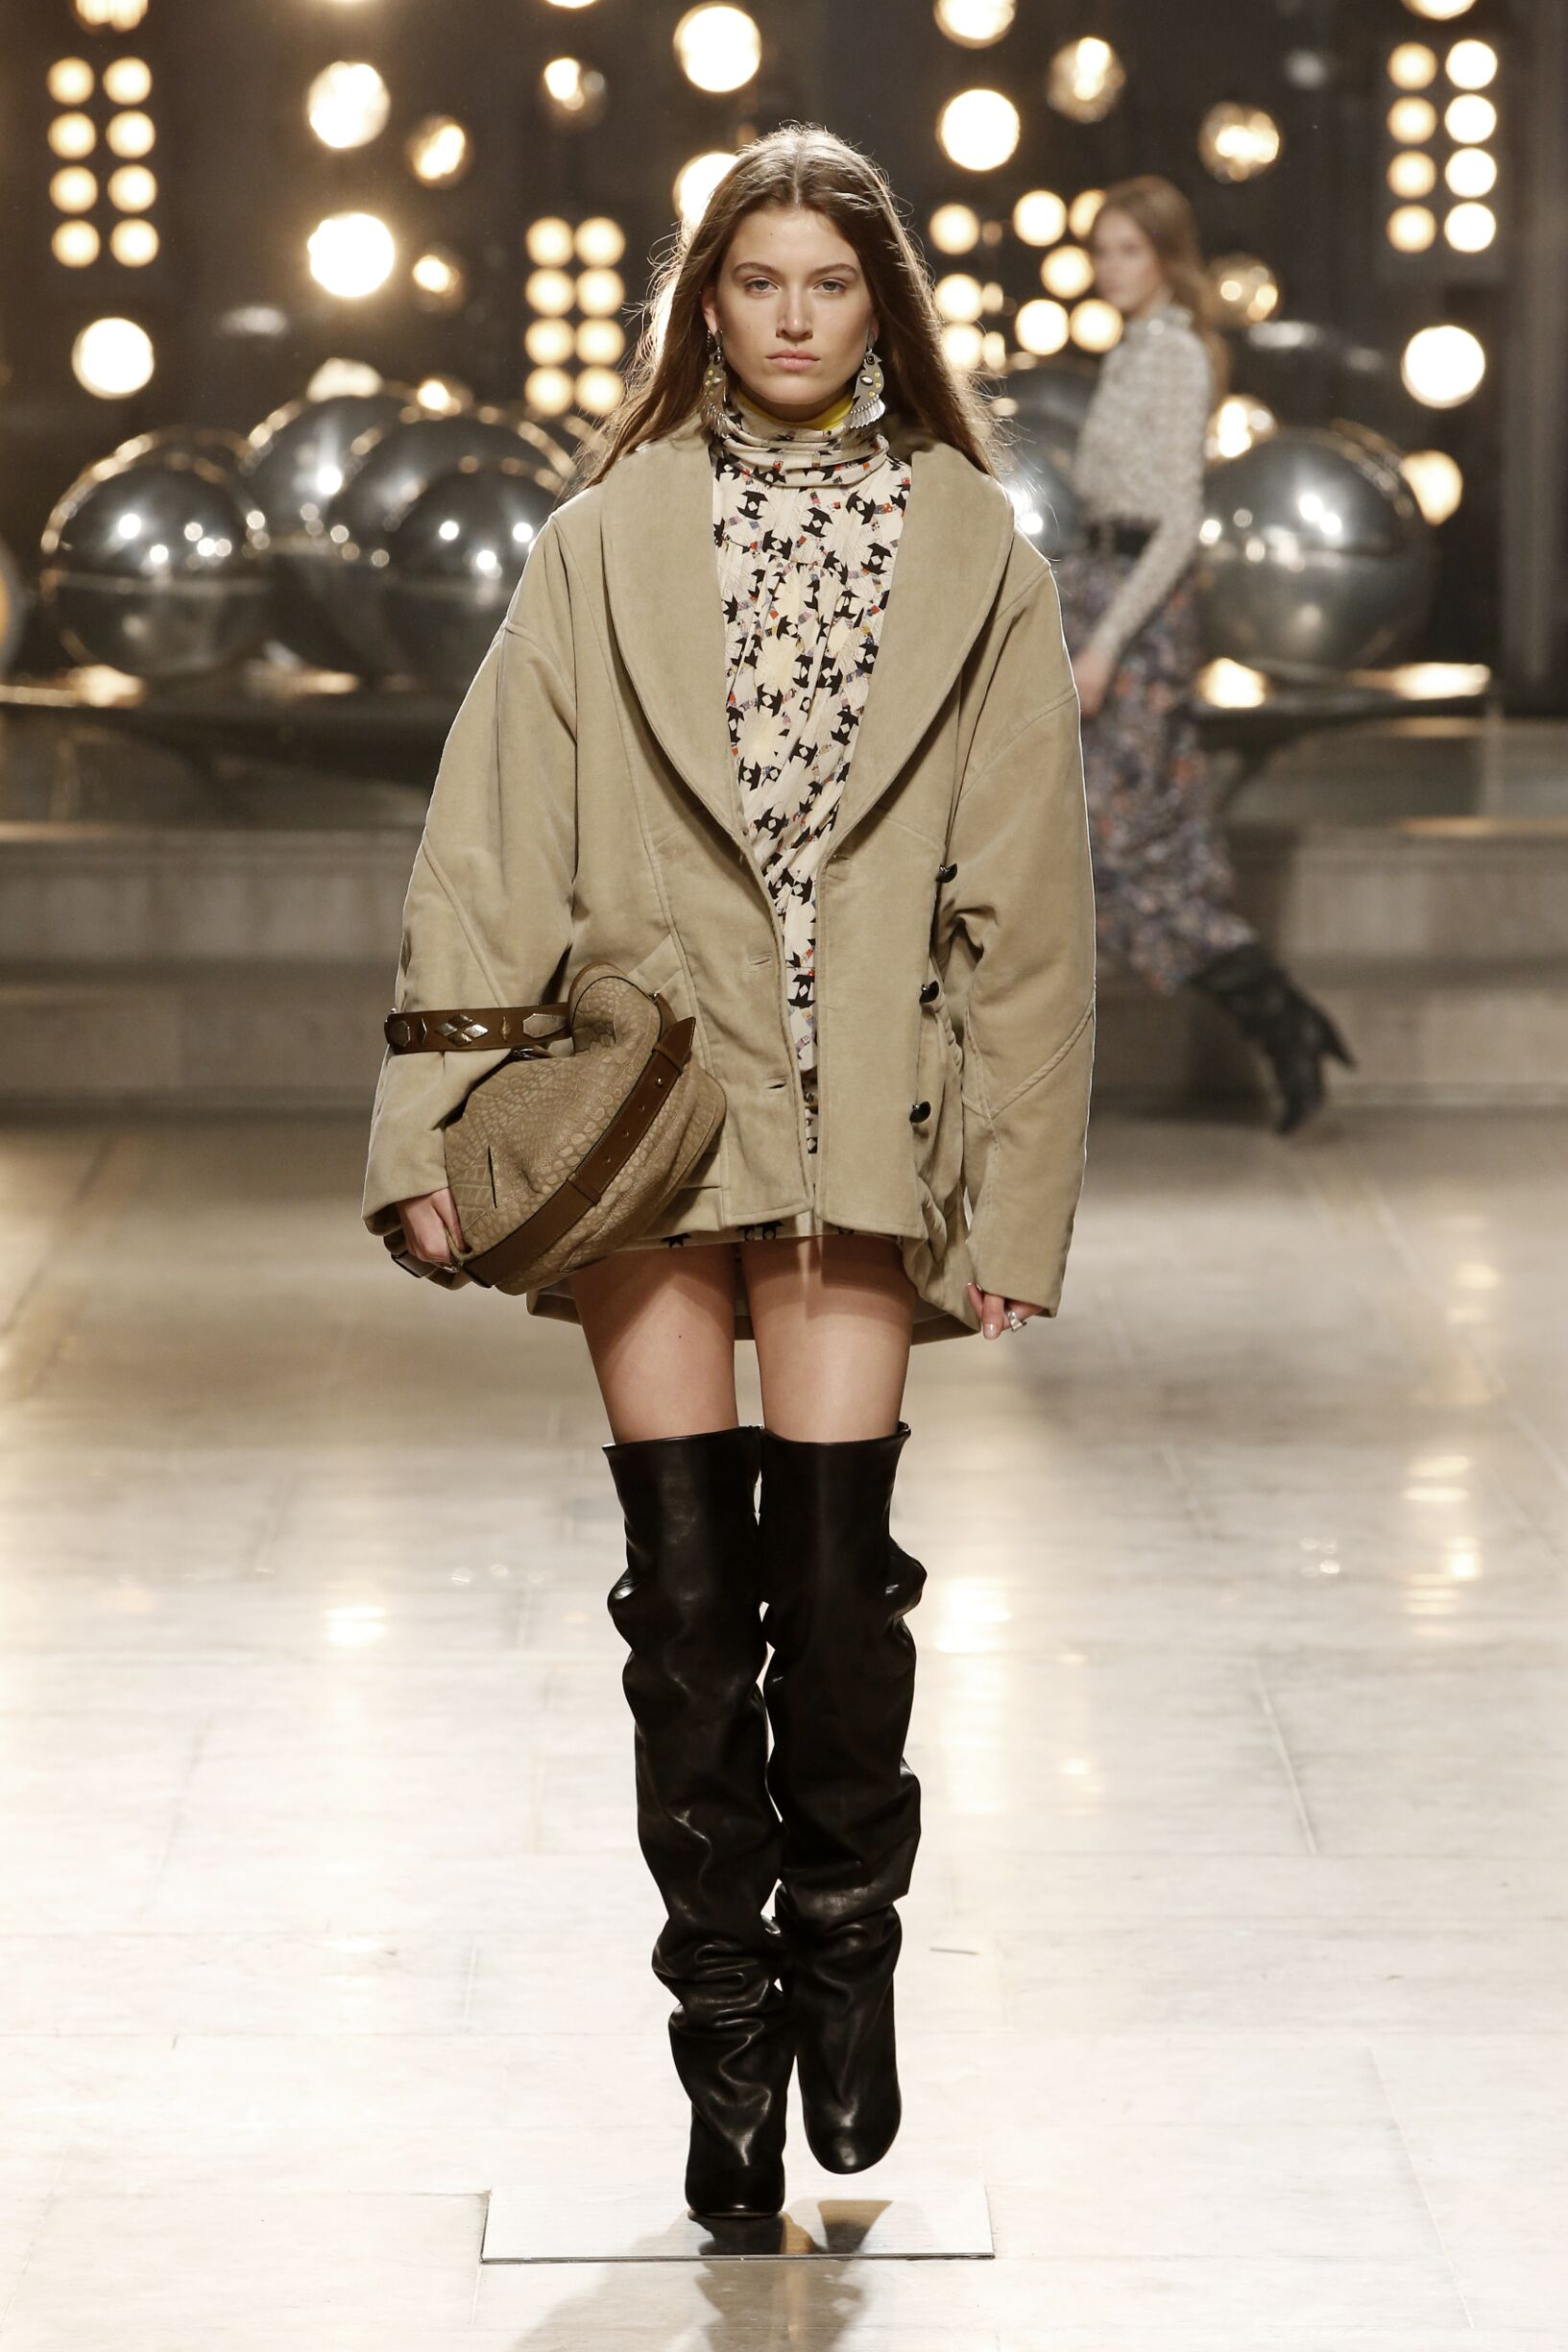 Winter 2019 Fashion Trends Isabel Marant